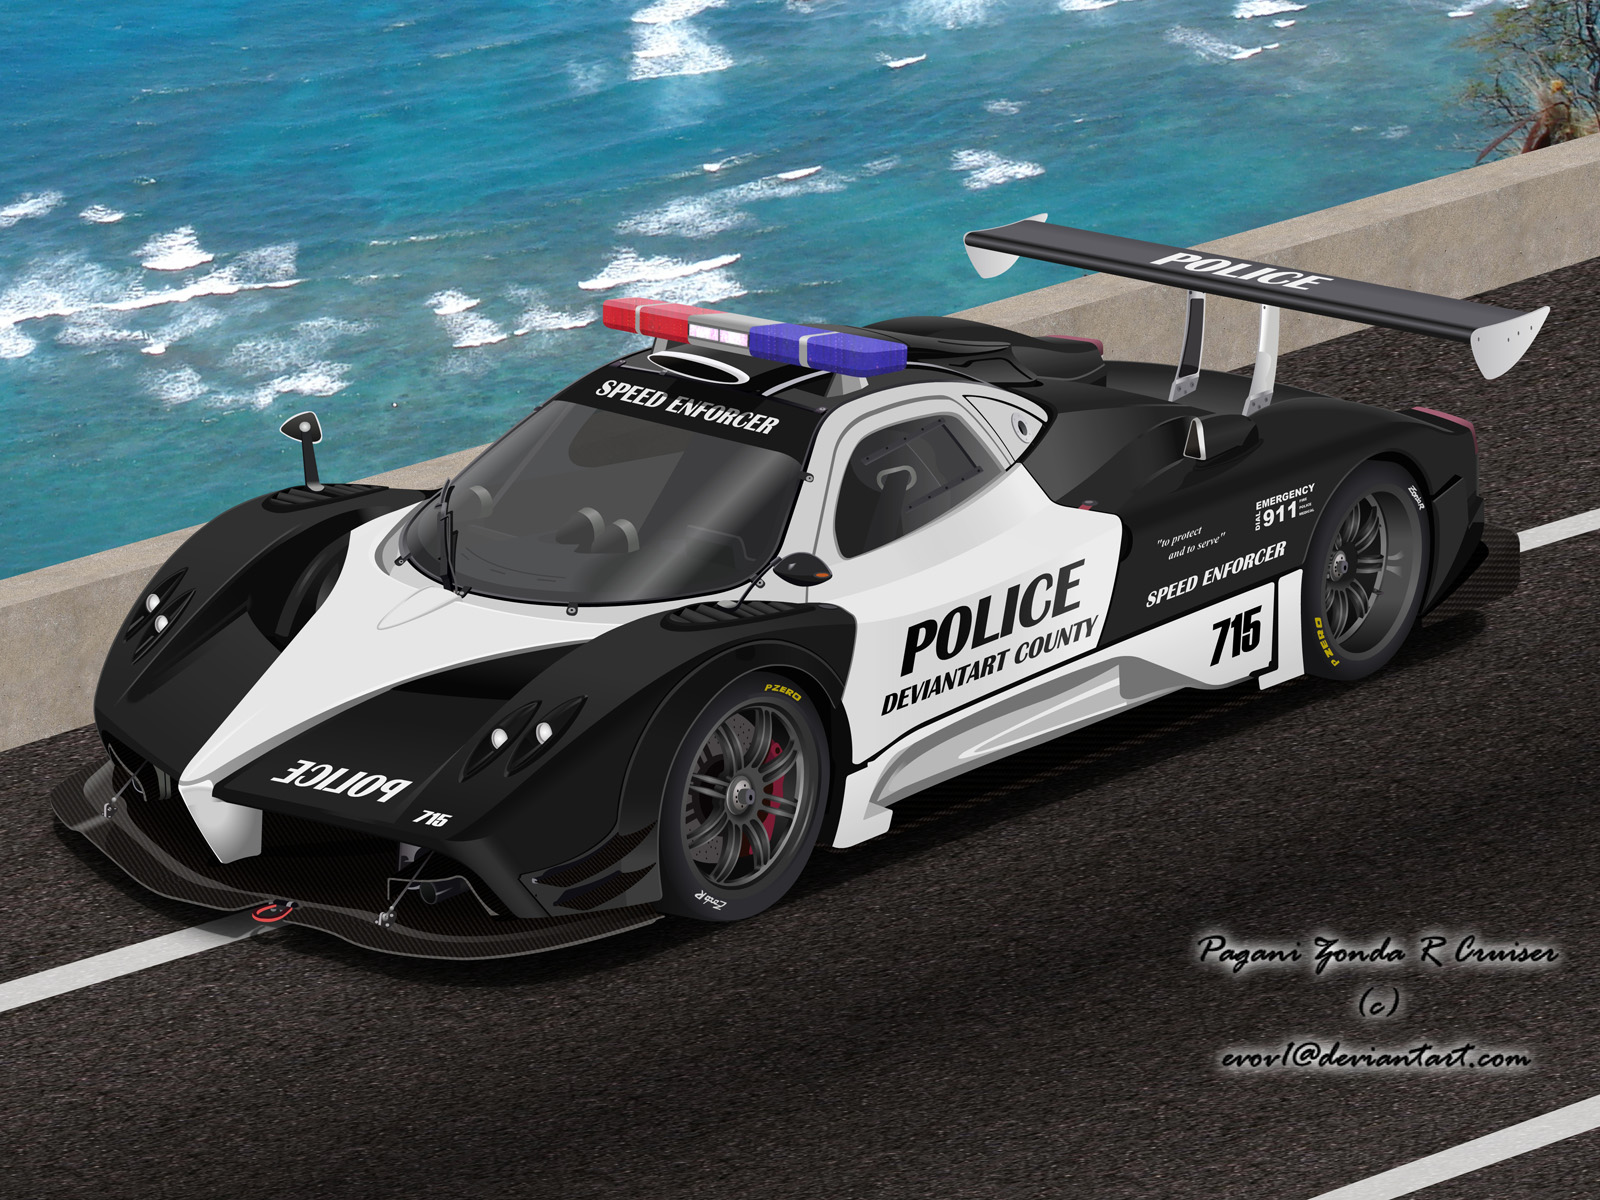 Pagani Zonda R Police Car